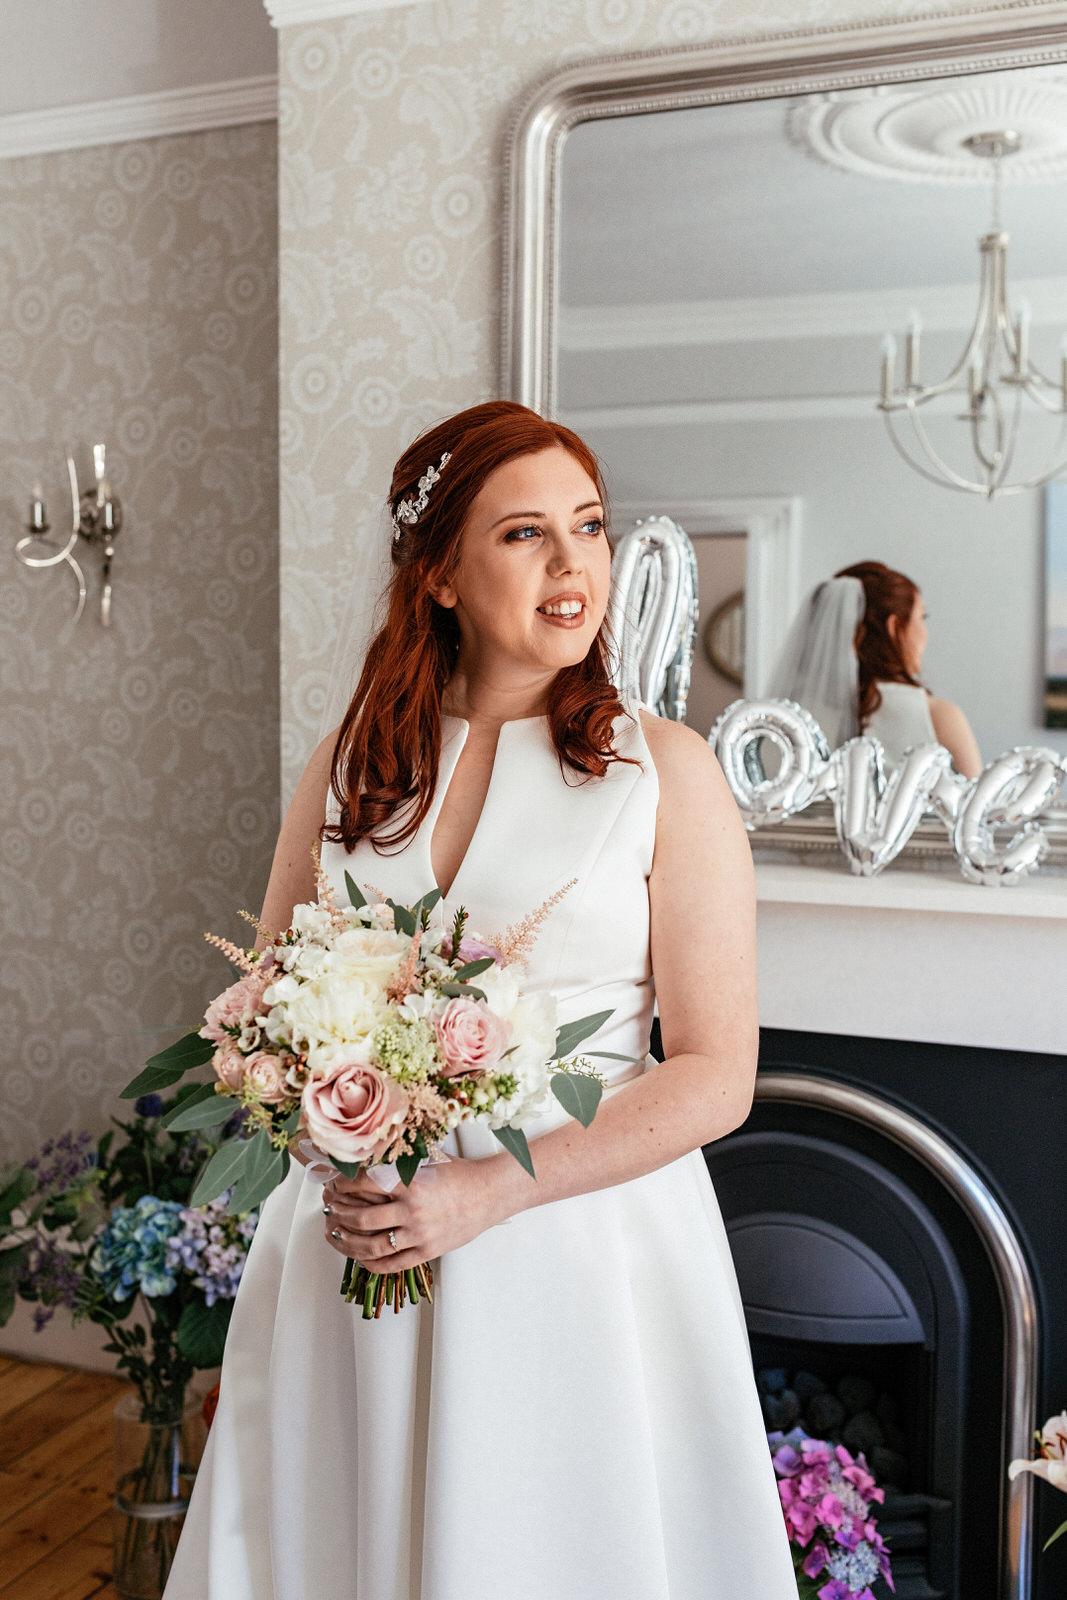 Beamish-Hall-Wedding-Photographer-011.jpg